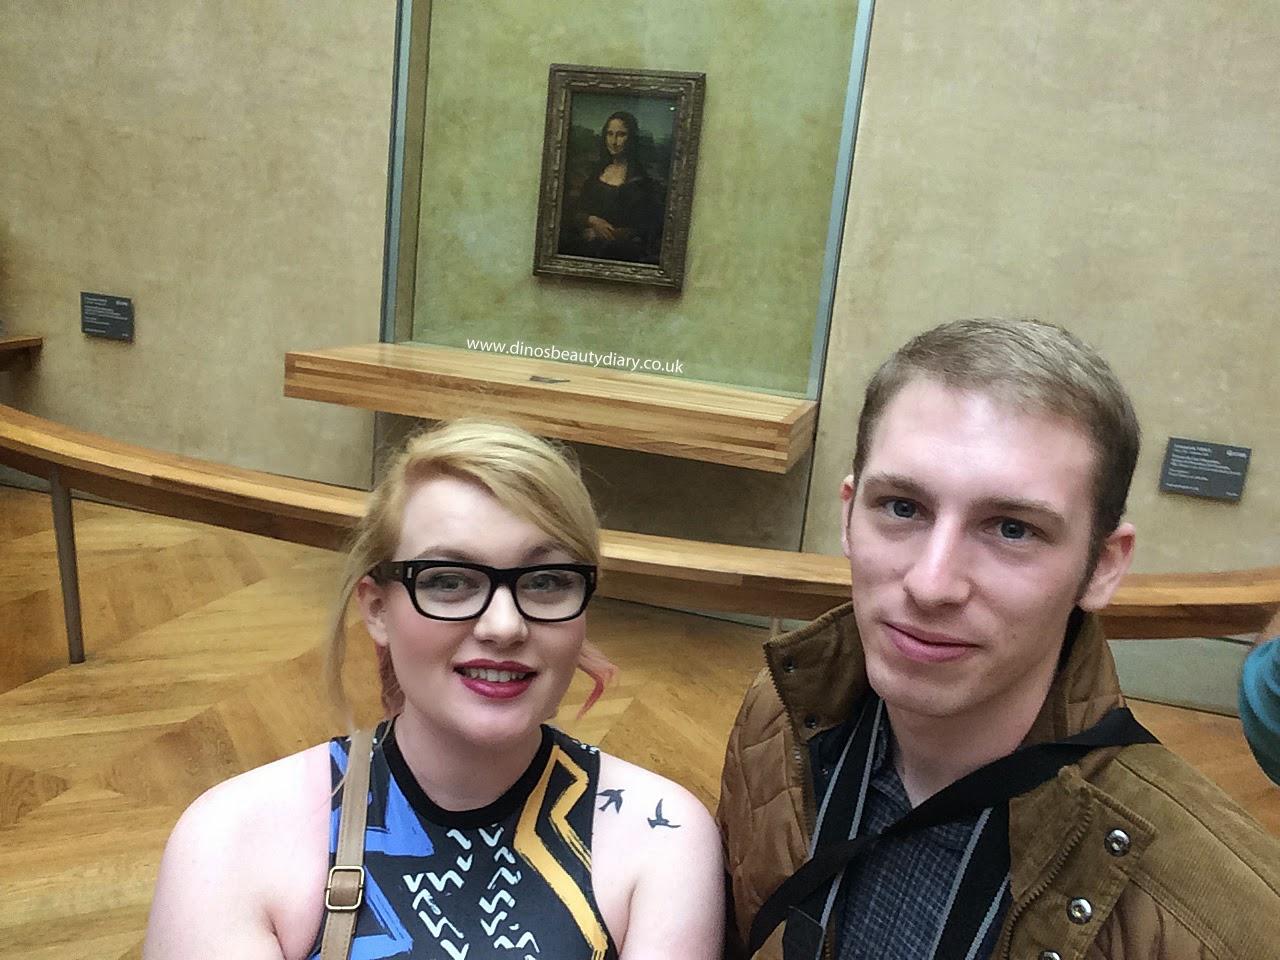 Dino's Beauty Diary - Paris Diary - Day Four - The Louvre Museum